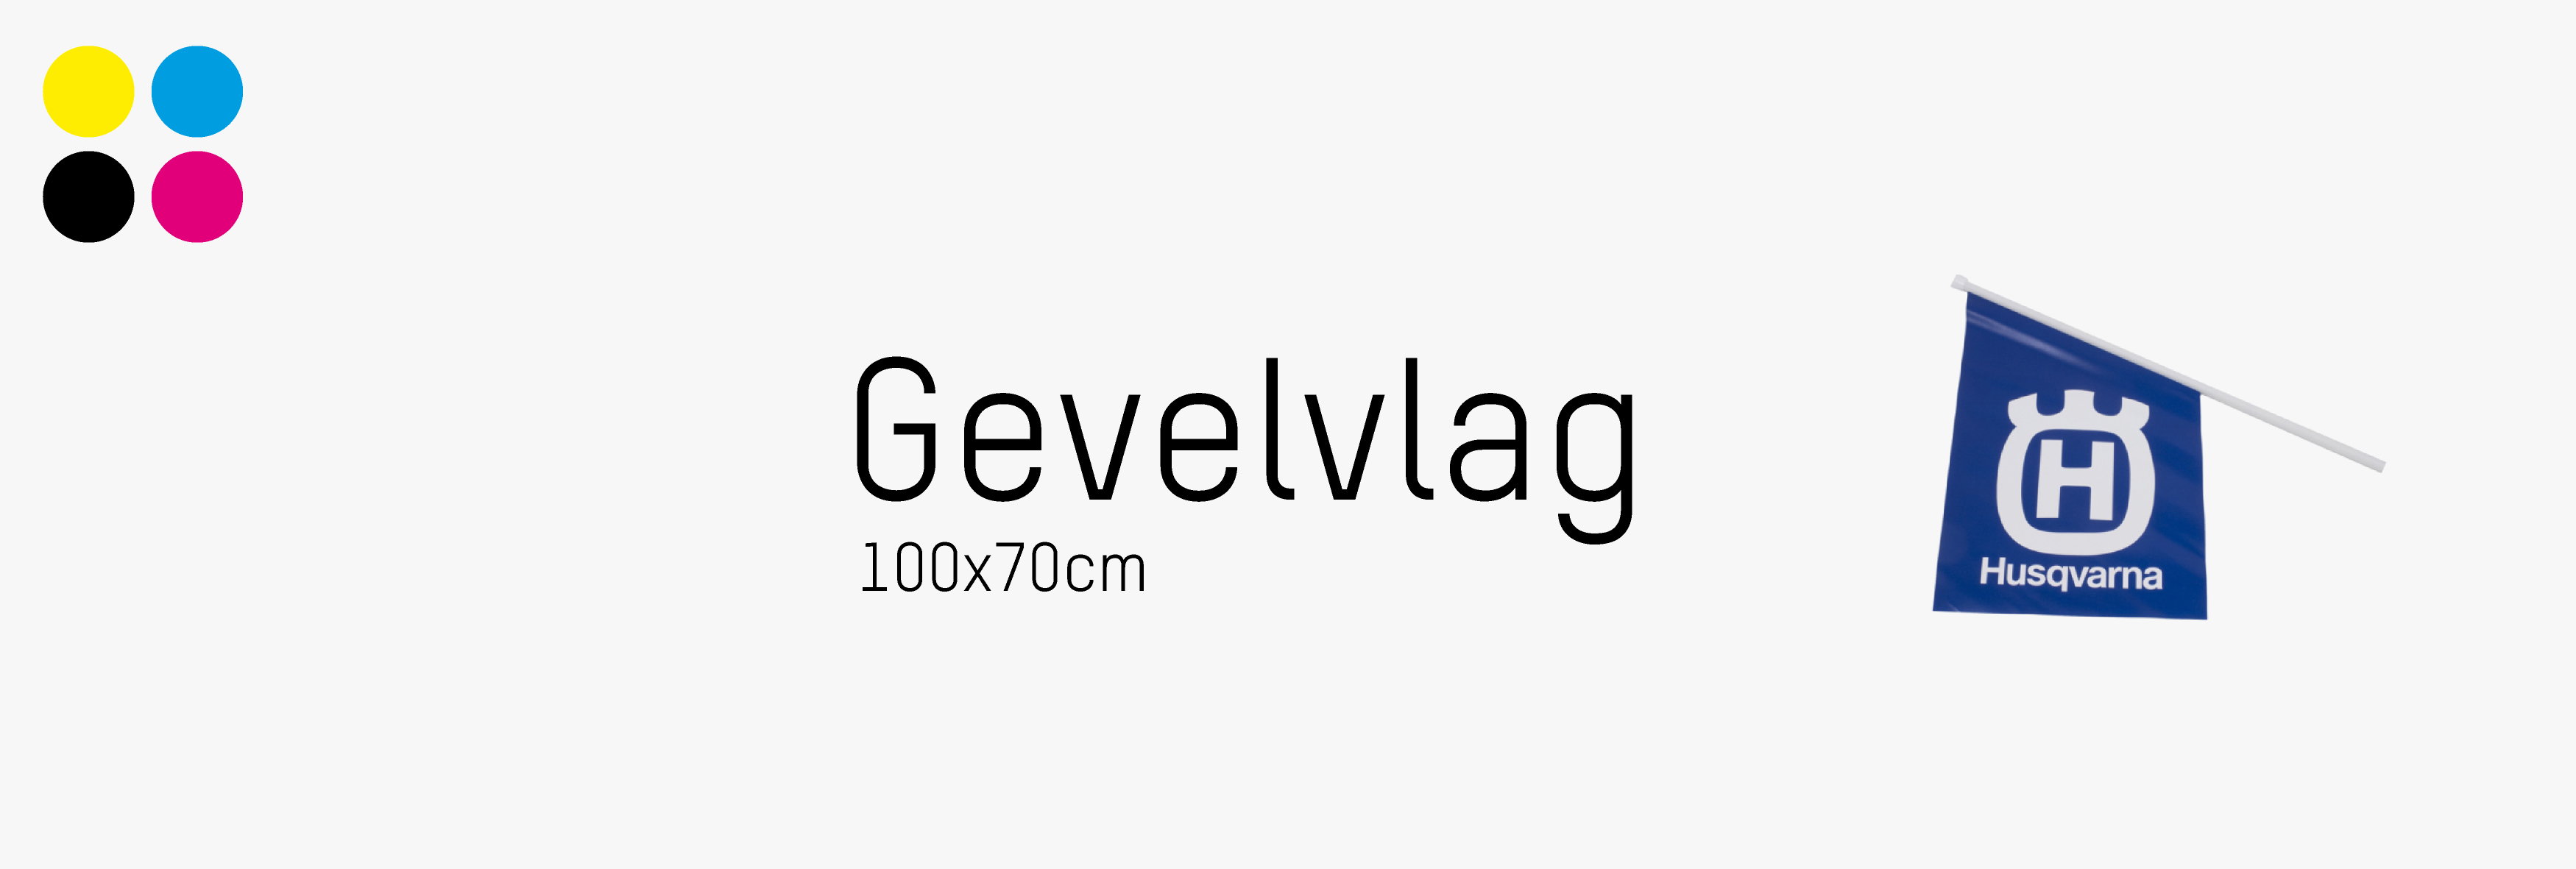 gevelvlag-100x70cm